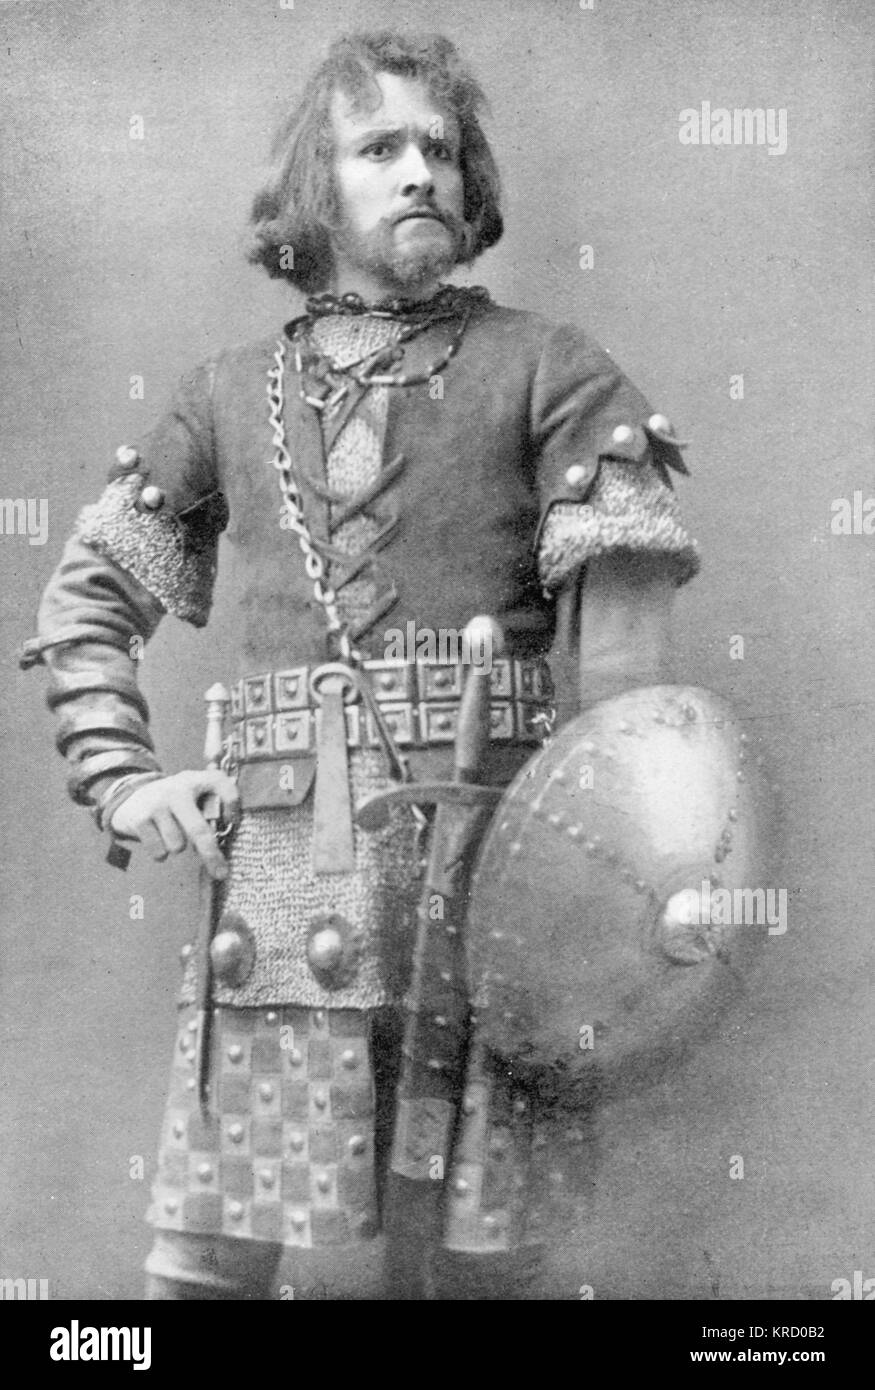 ROBERT TAYLOR  Actor in the  role of Macduff in  Shakespeare's Macbeth        Date: c. 1900 - Stock Image